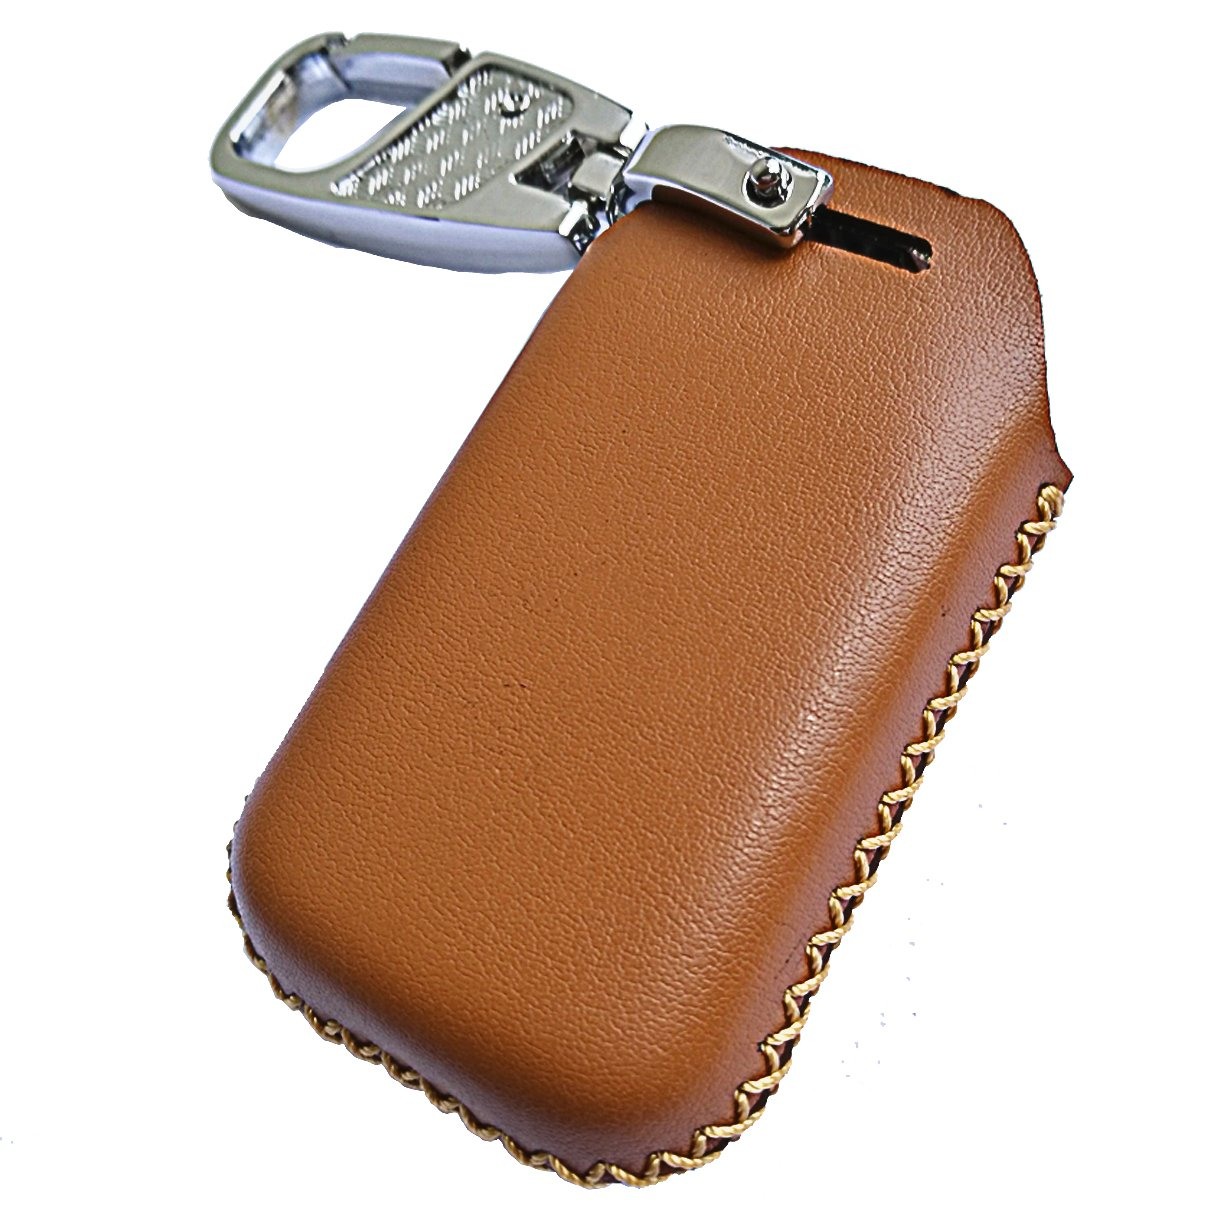 Amazon.com: Alegender Genuine Leather Smart Key Remote Fob Case ...